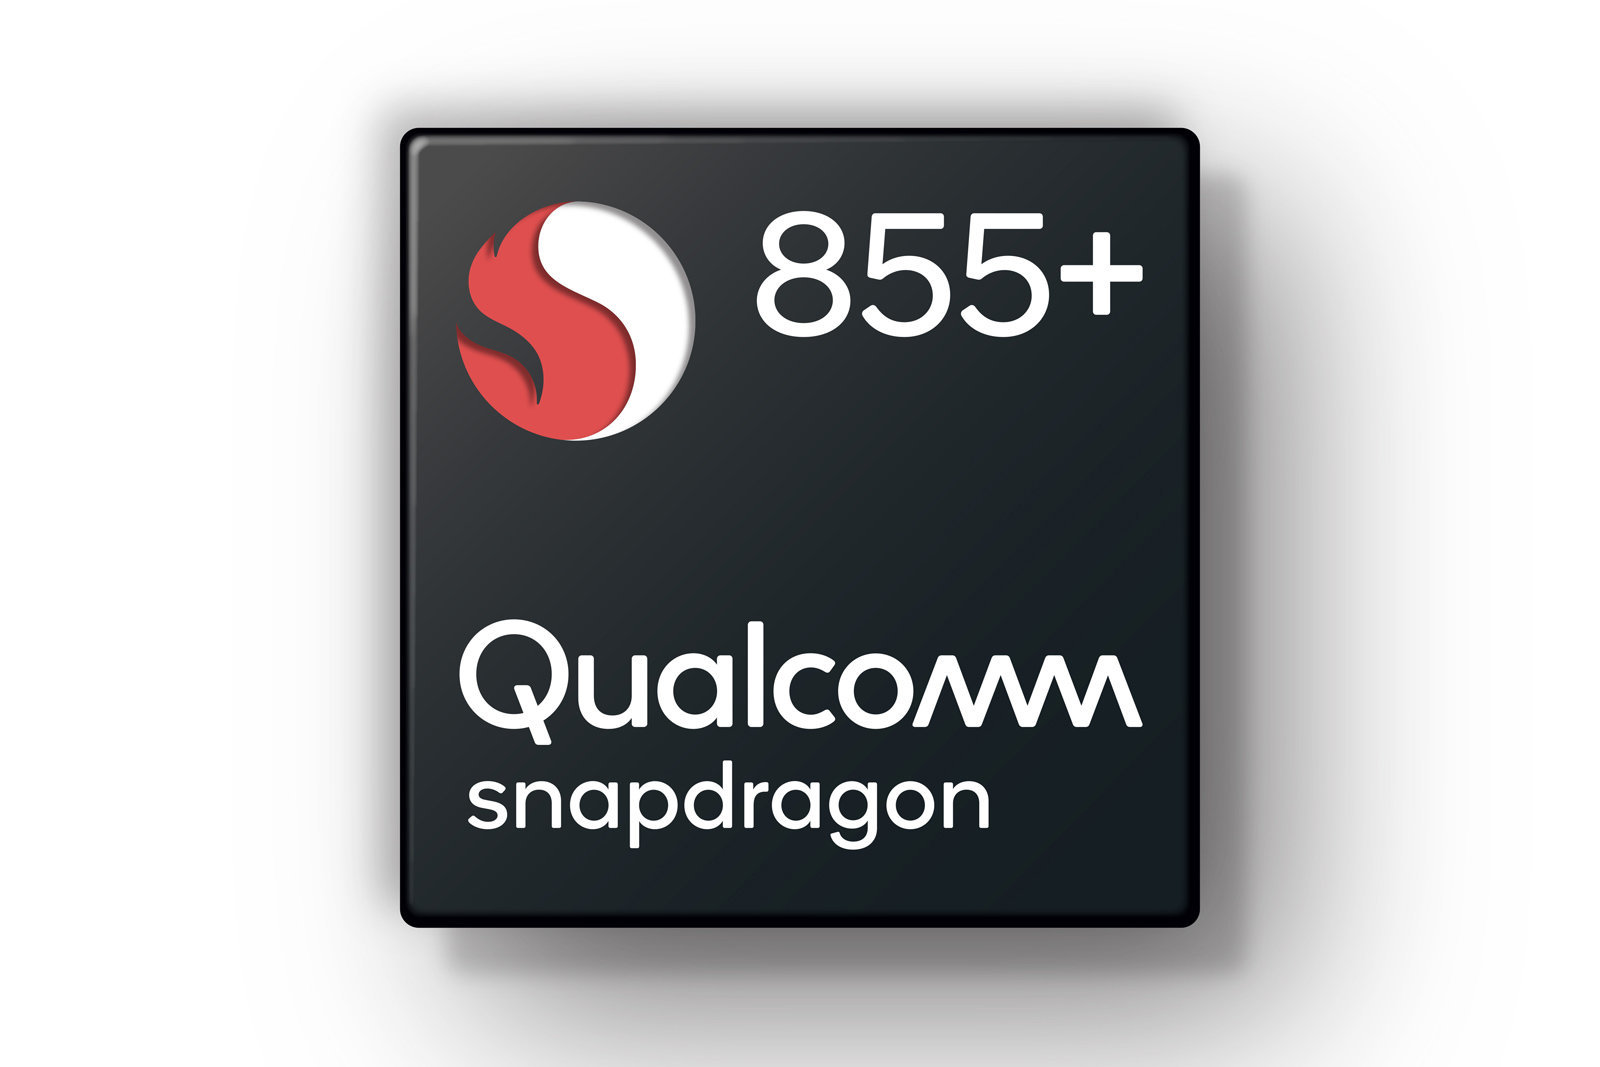 Novo chip snapdragon 855 plus chip